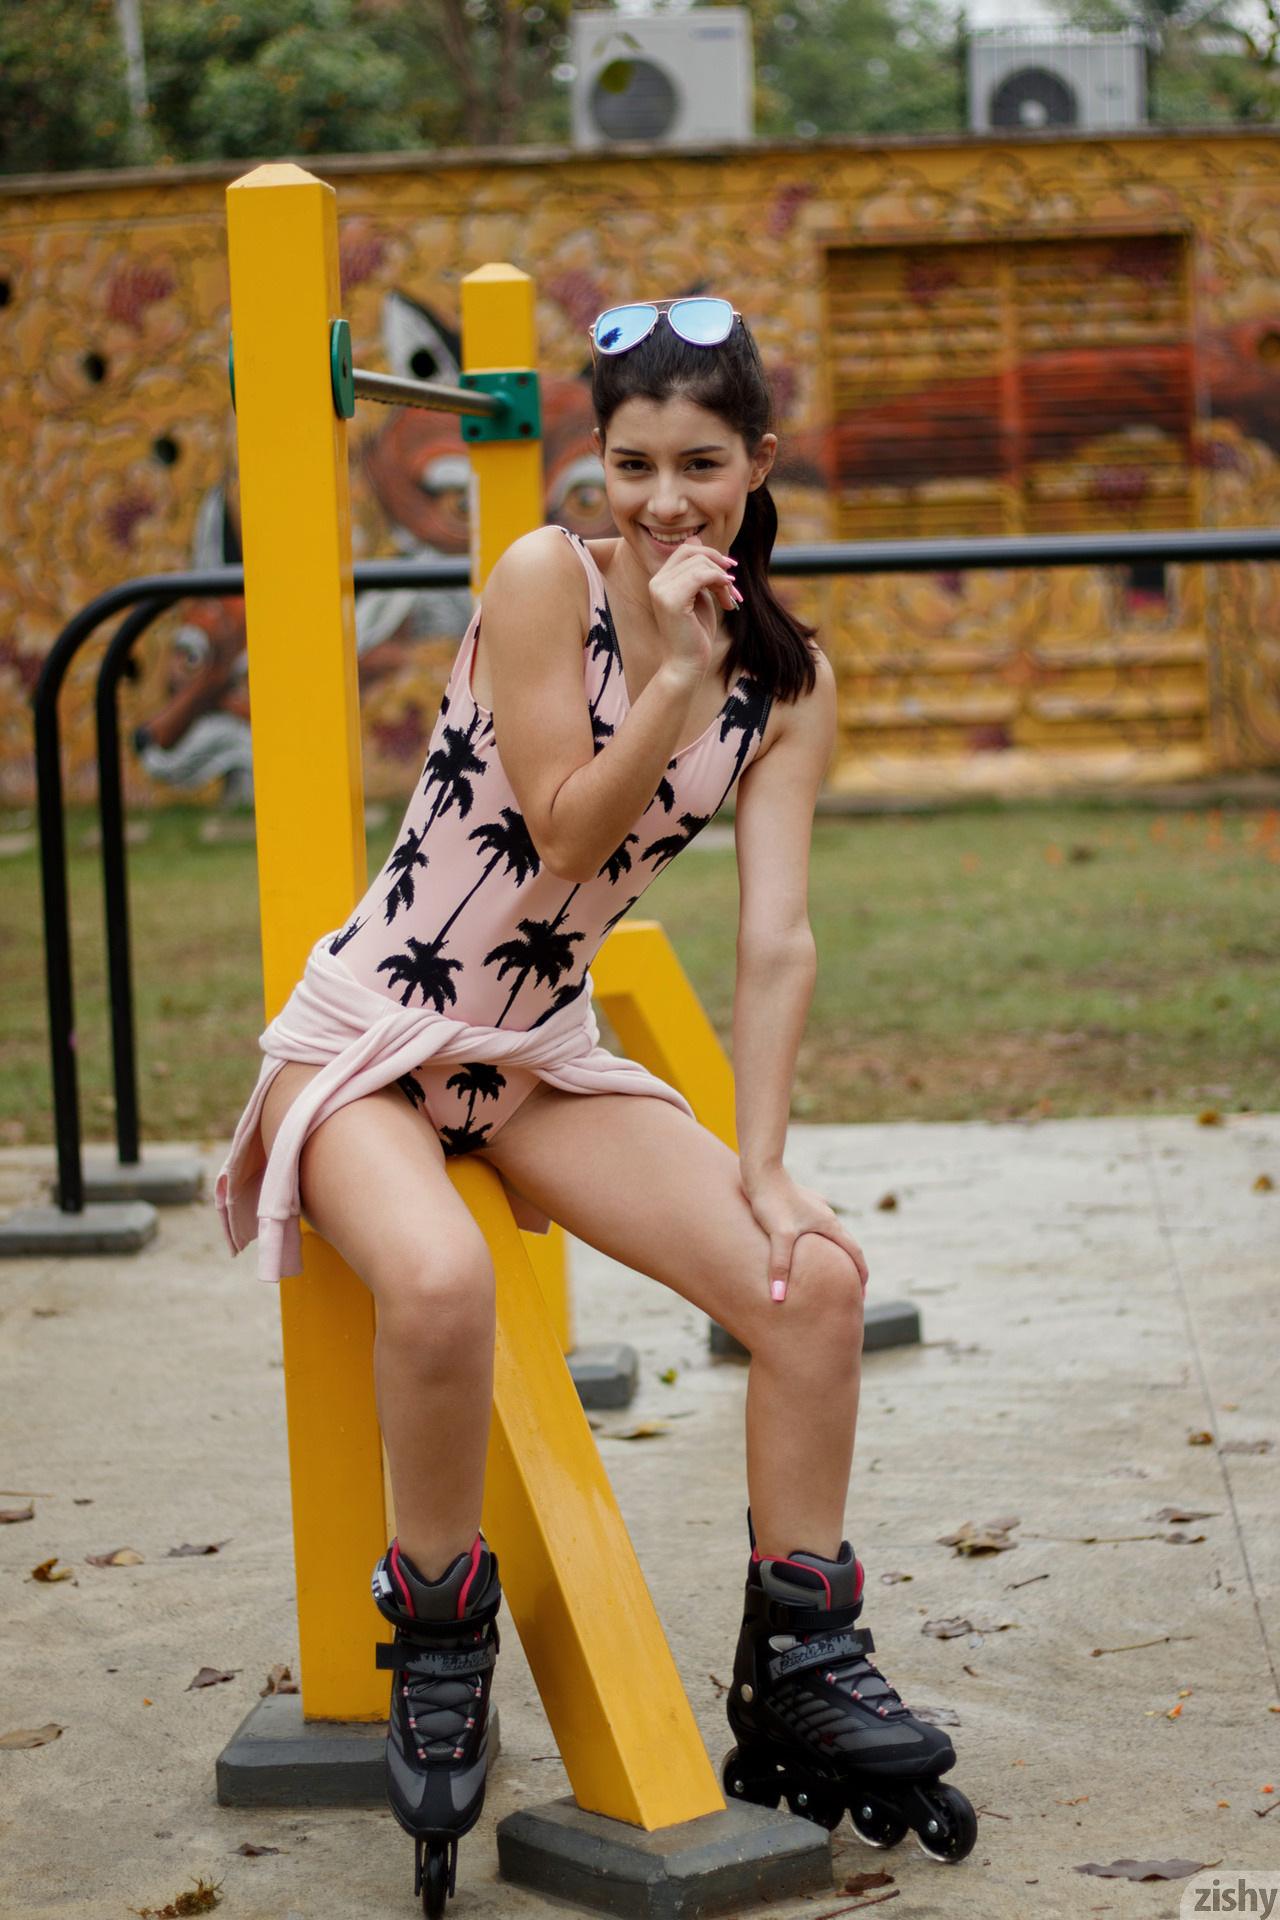 Kate Maze Skates Colombia Zishy (45)